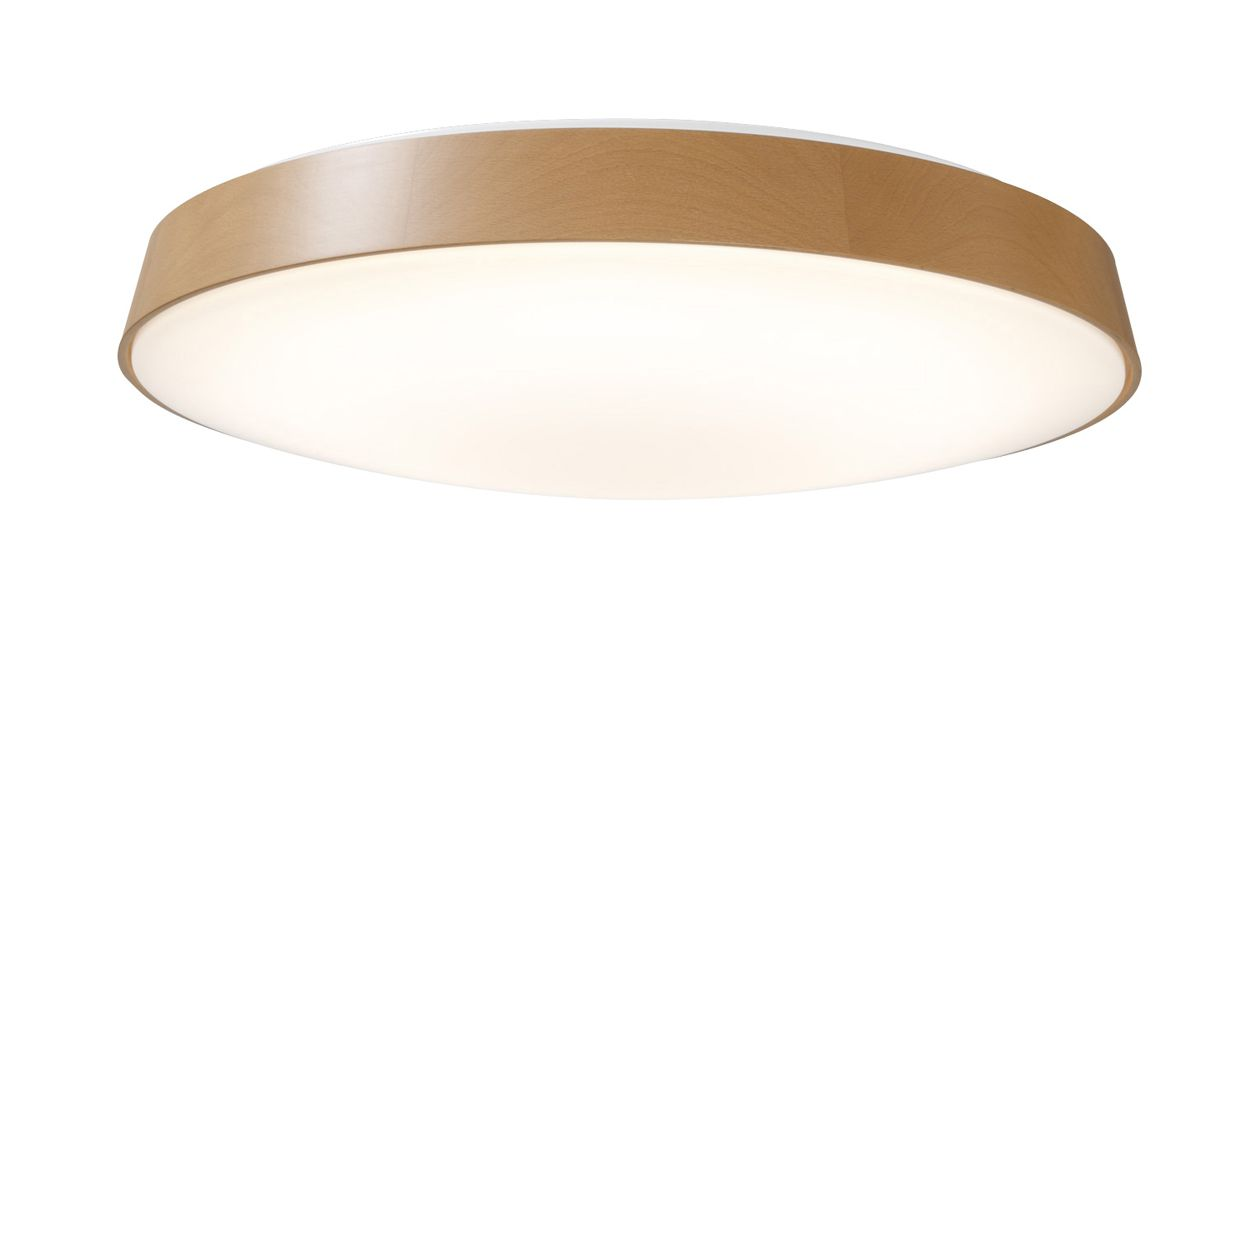 LED木製シーリングライト・調光調色機能付・ダークブラウン ナチュラル